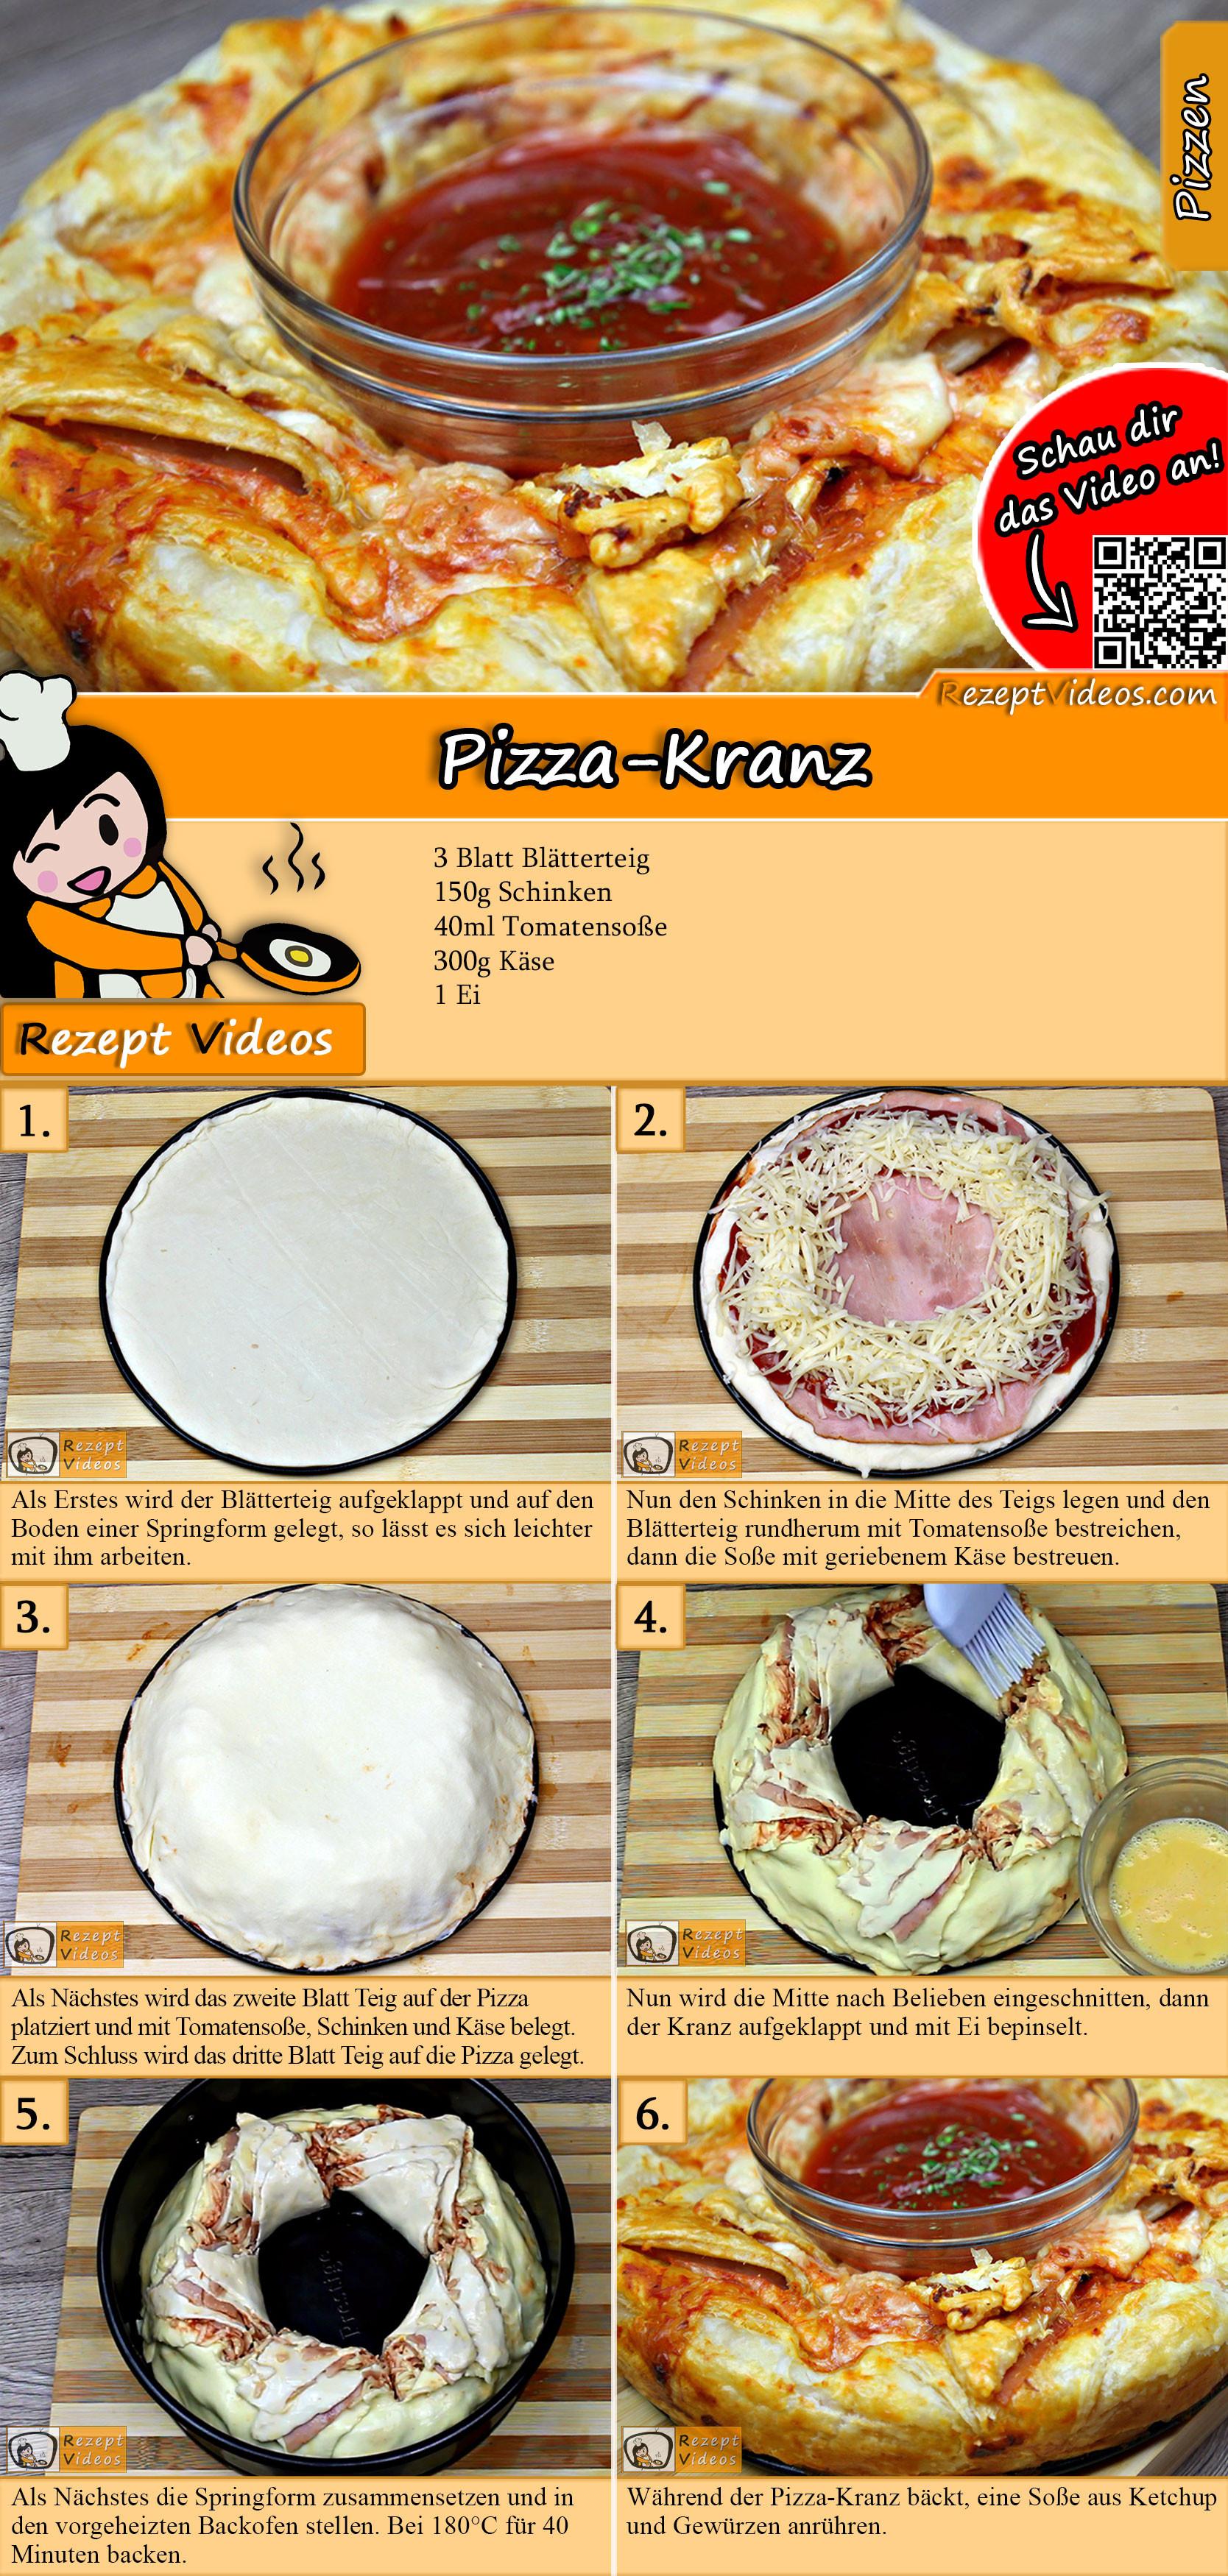 Pizza-Kranz Rezept mit Video